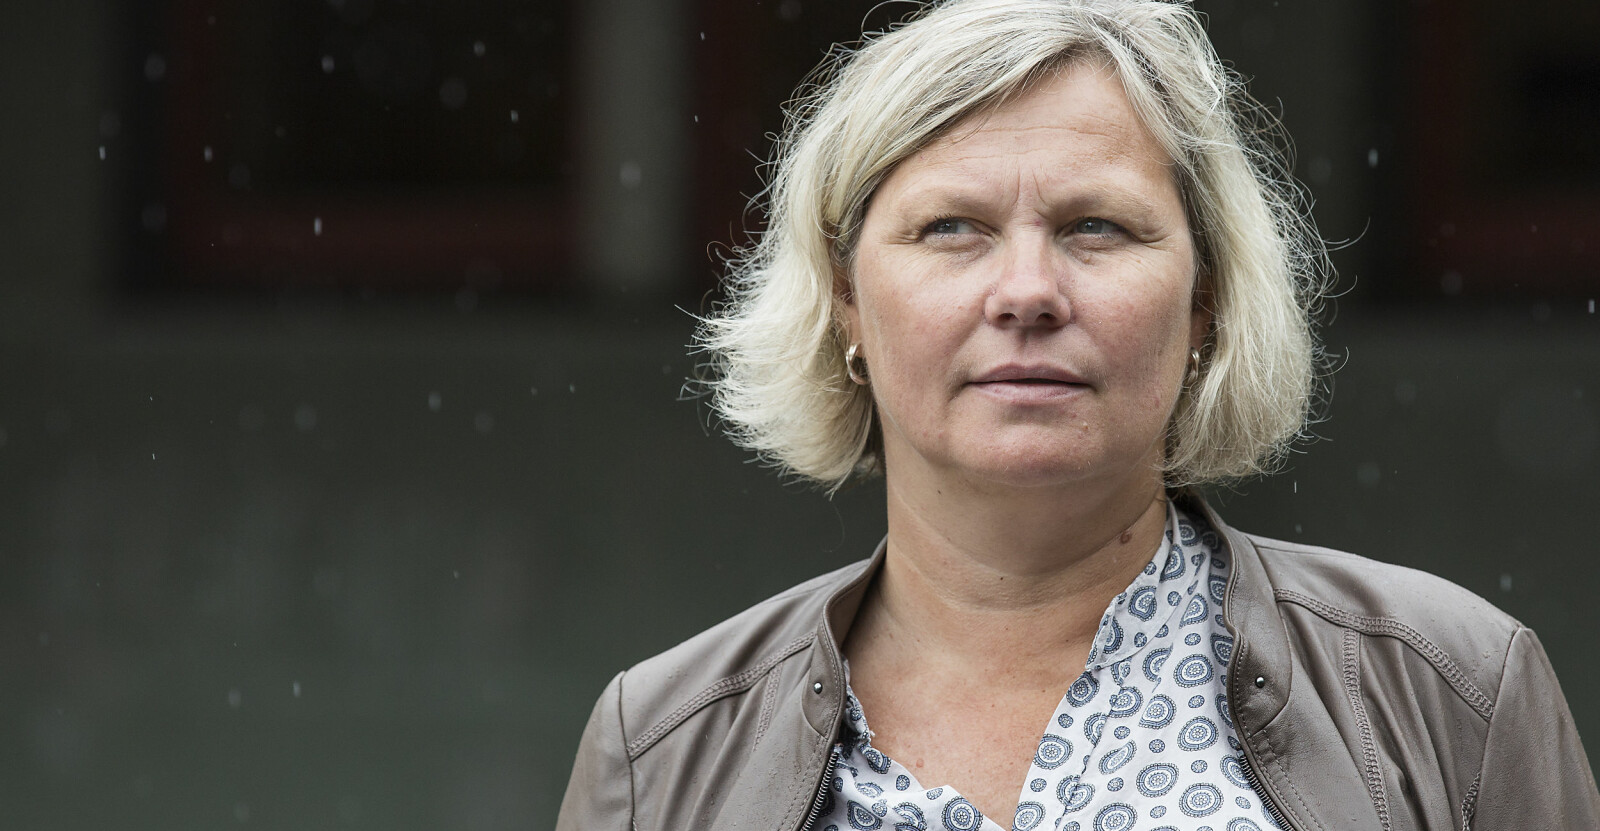 Monika Antun, rektor ved Vaksdal skule i Hordaland.